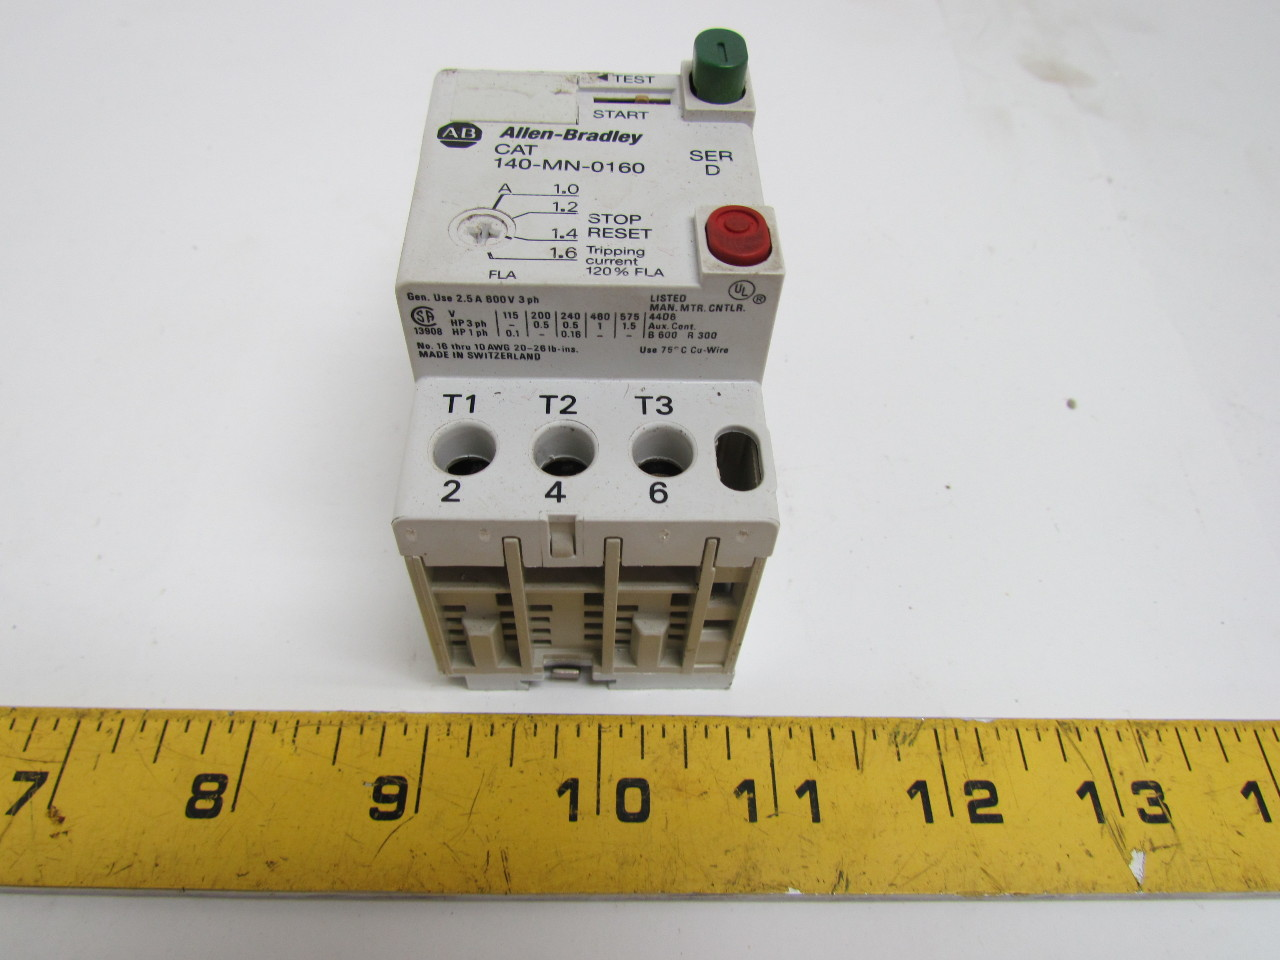 Allen Bradley 140 Mn 0160 Series D Manual Motor Starter 2